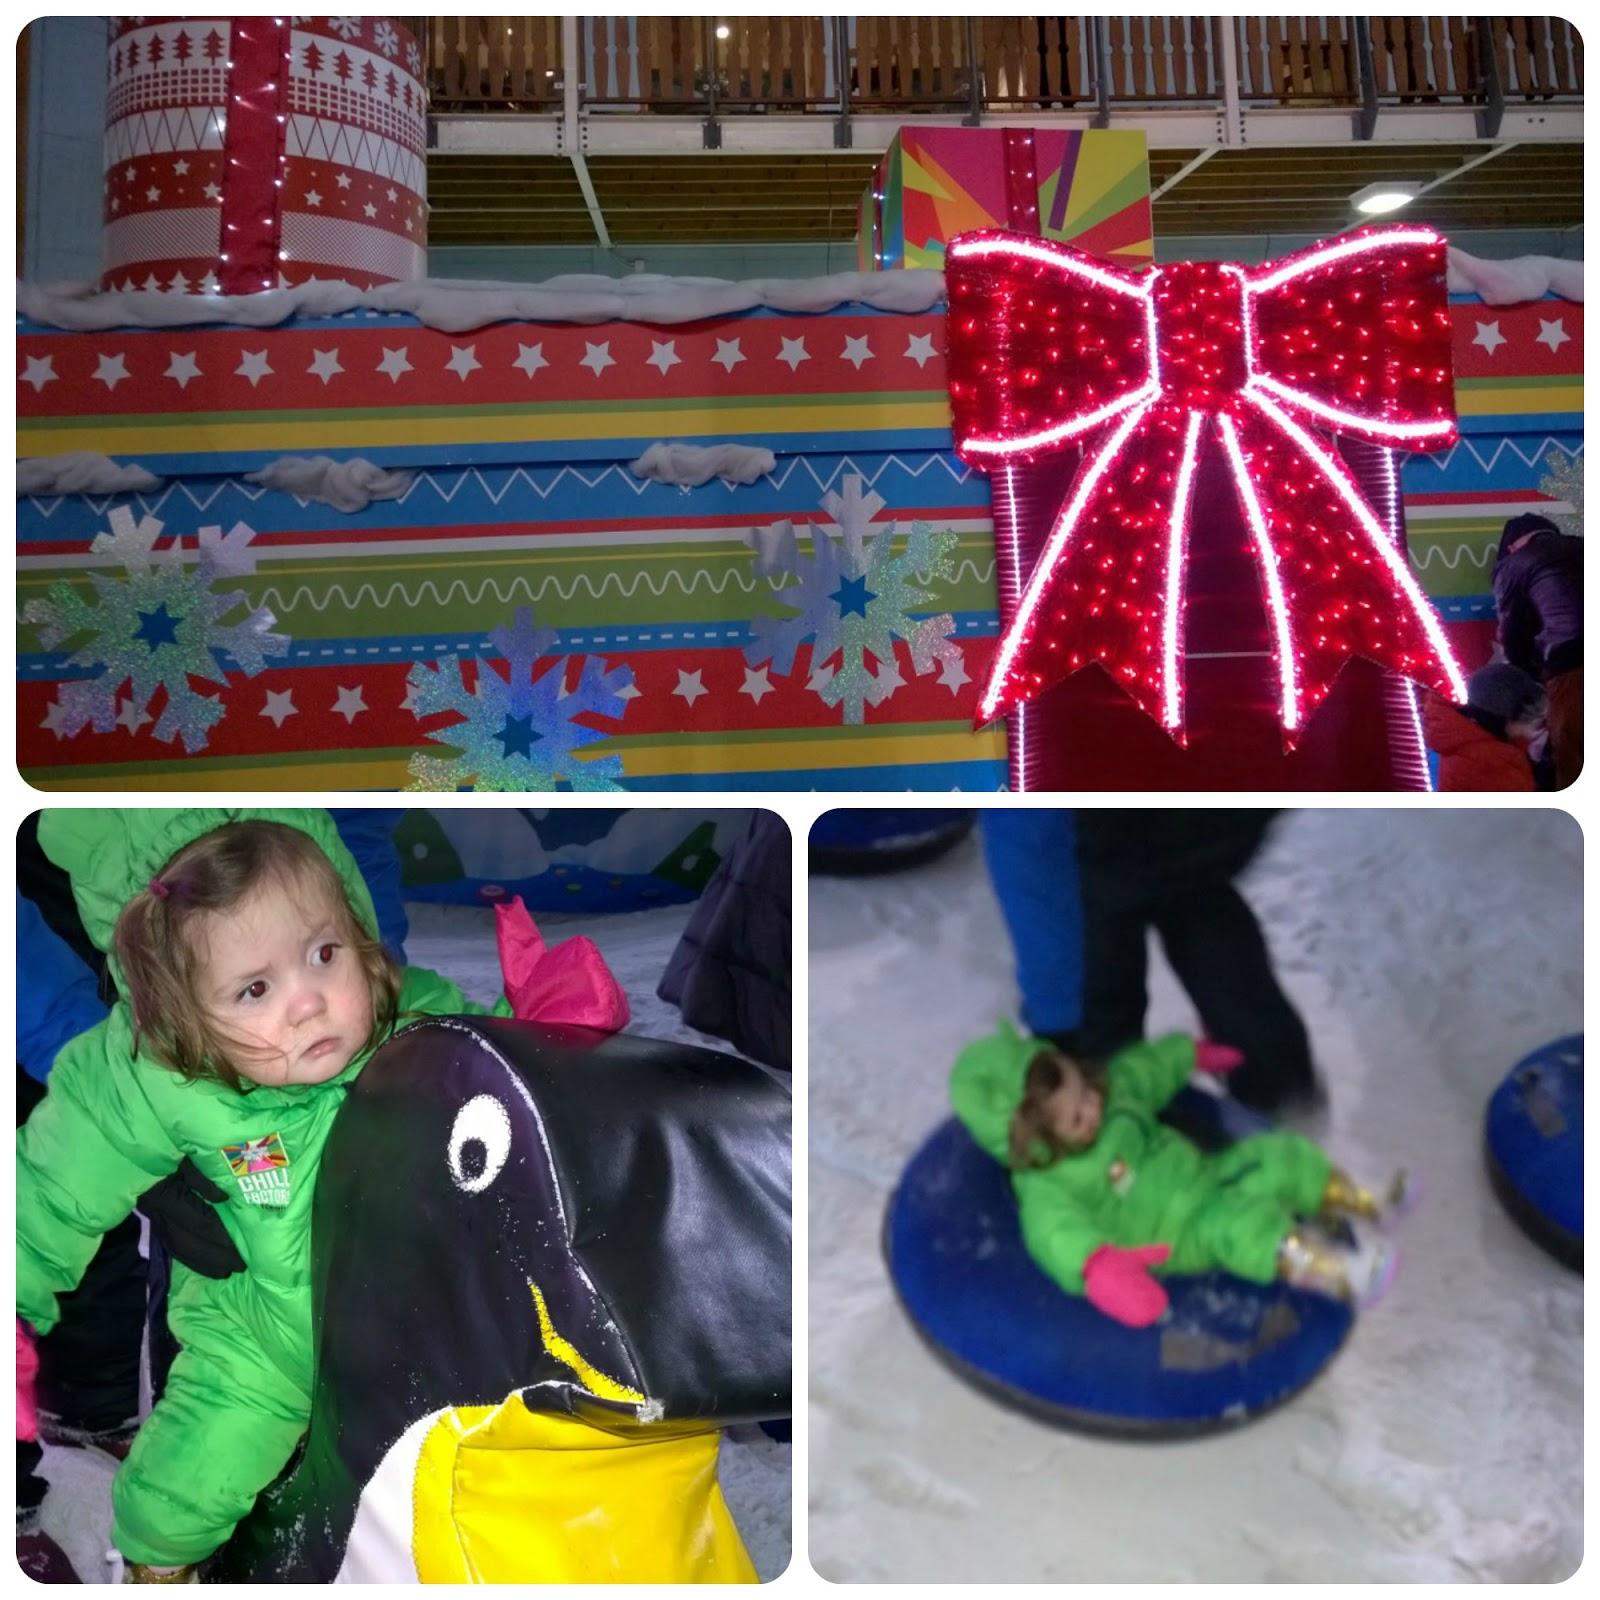 Mini Moose Land Chill Factore Christmas 2014